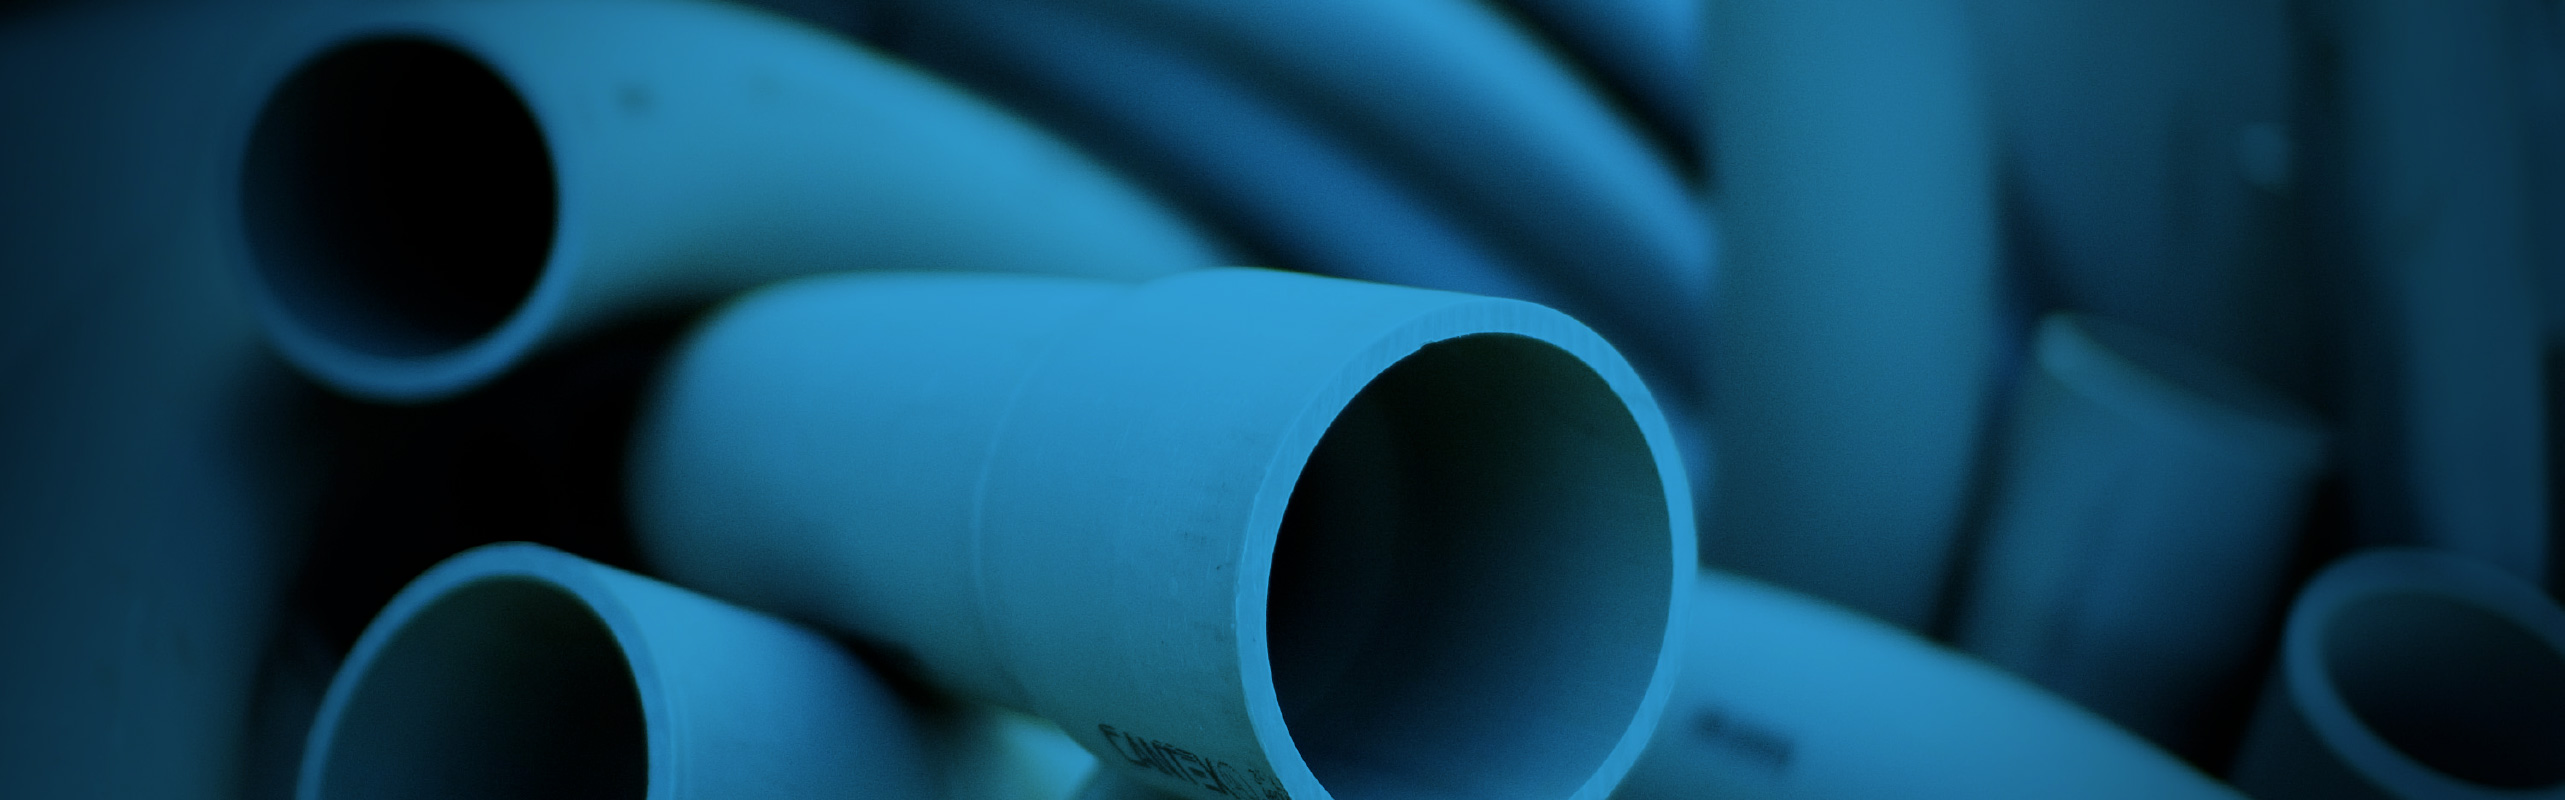 Whitehead Plumbing & Gas - Banner